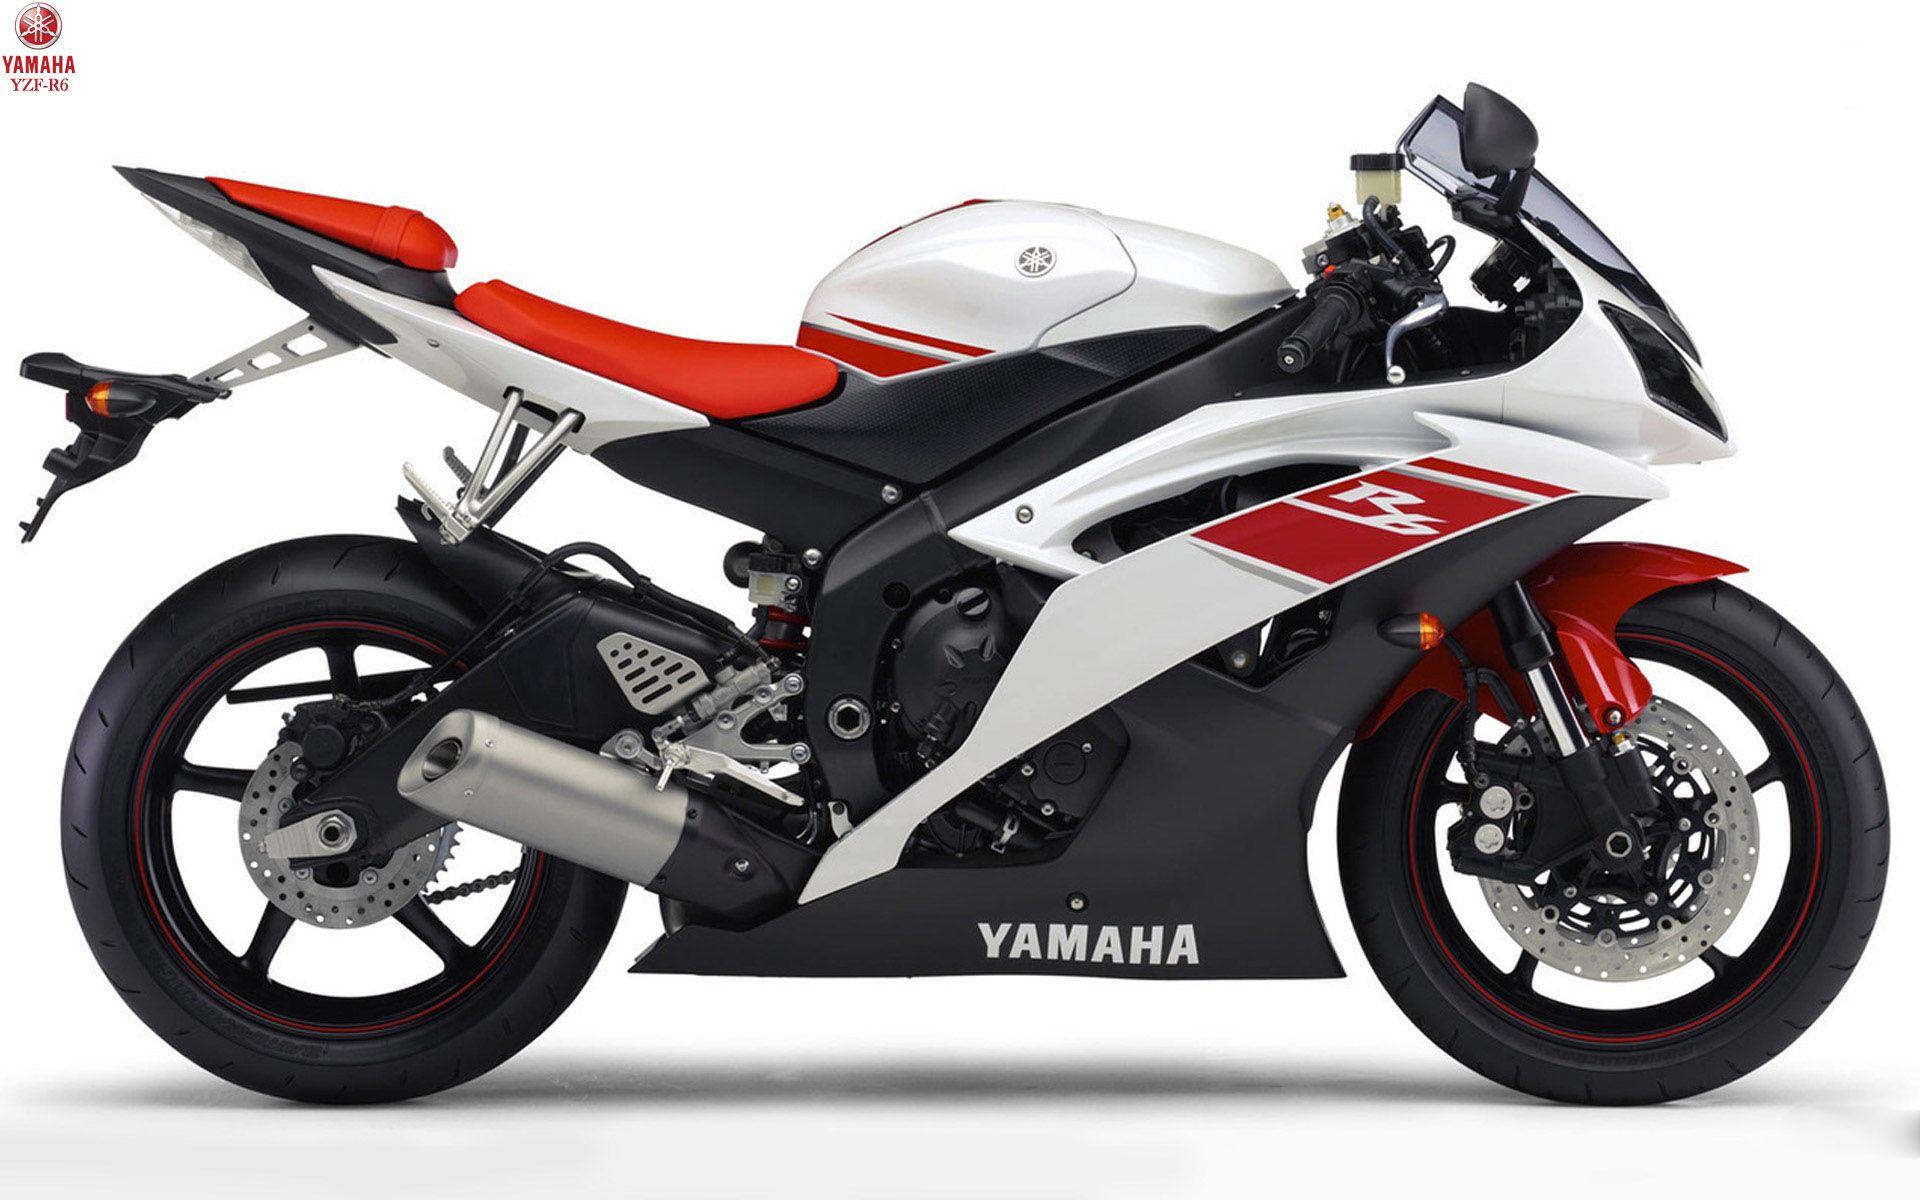 Yamaha Yzf R6 Hd Wallpapers Yamaha R6 Yamaha Yzf R6 Bike Bmw